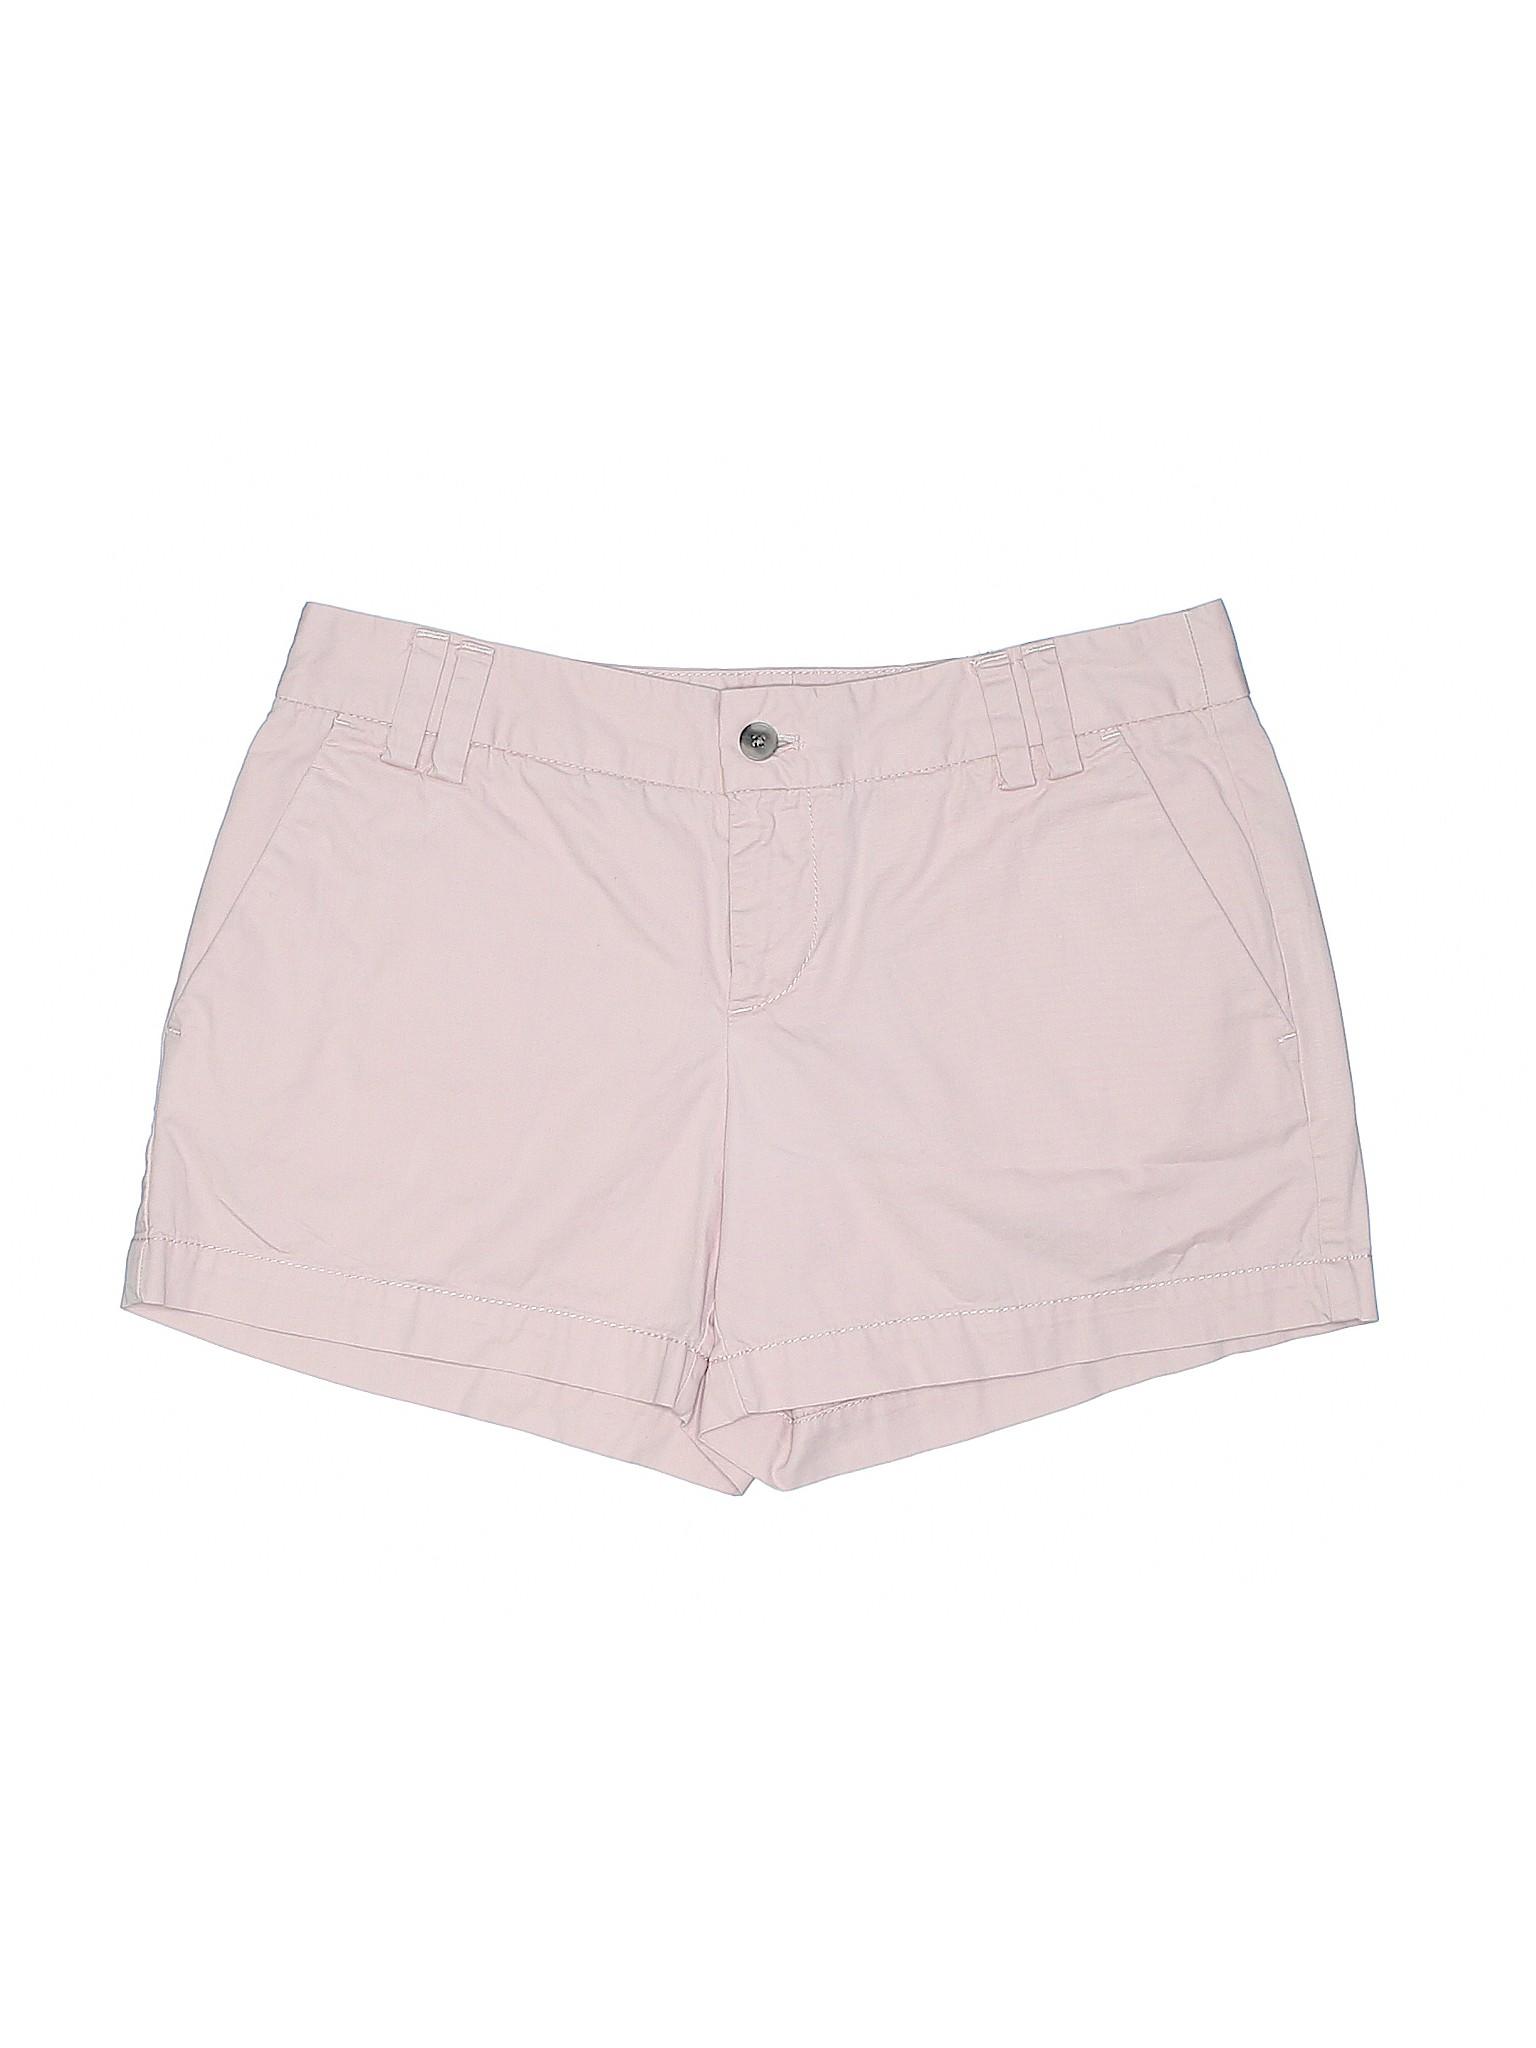 Ann LOFT Taylor Boutique Shorts Khaki vqYqPCT